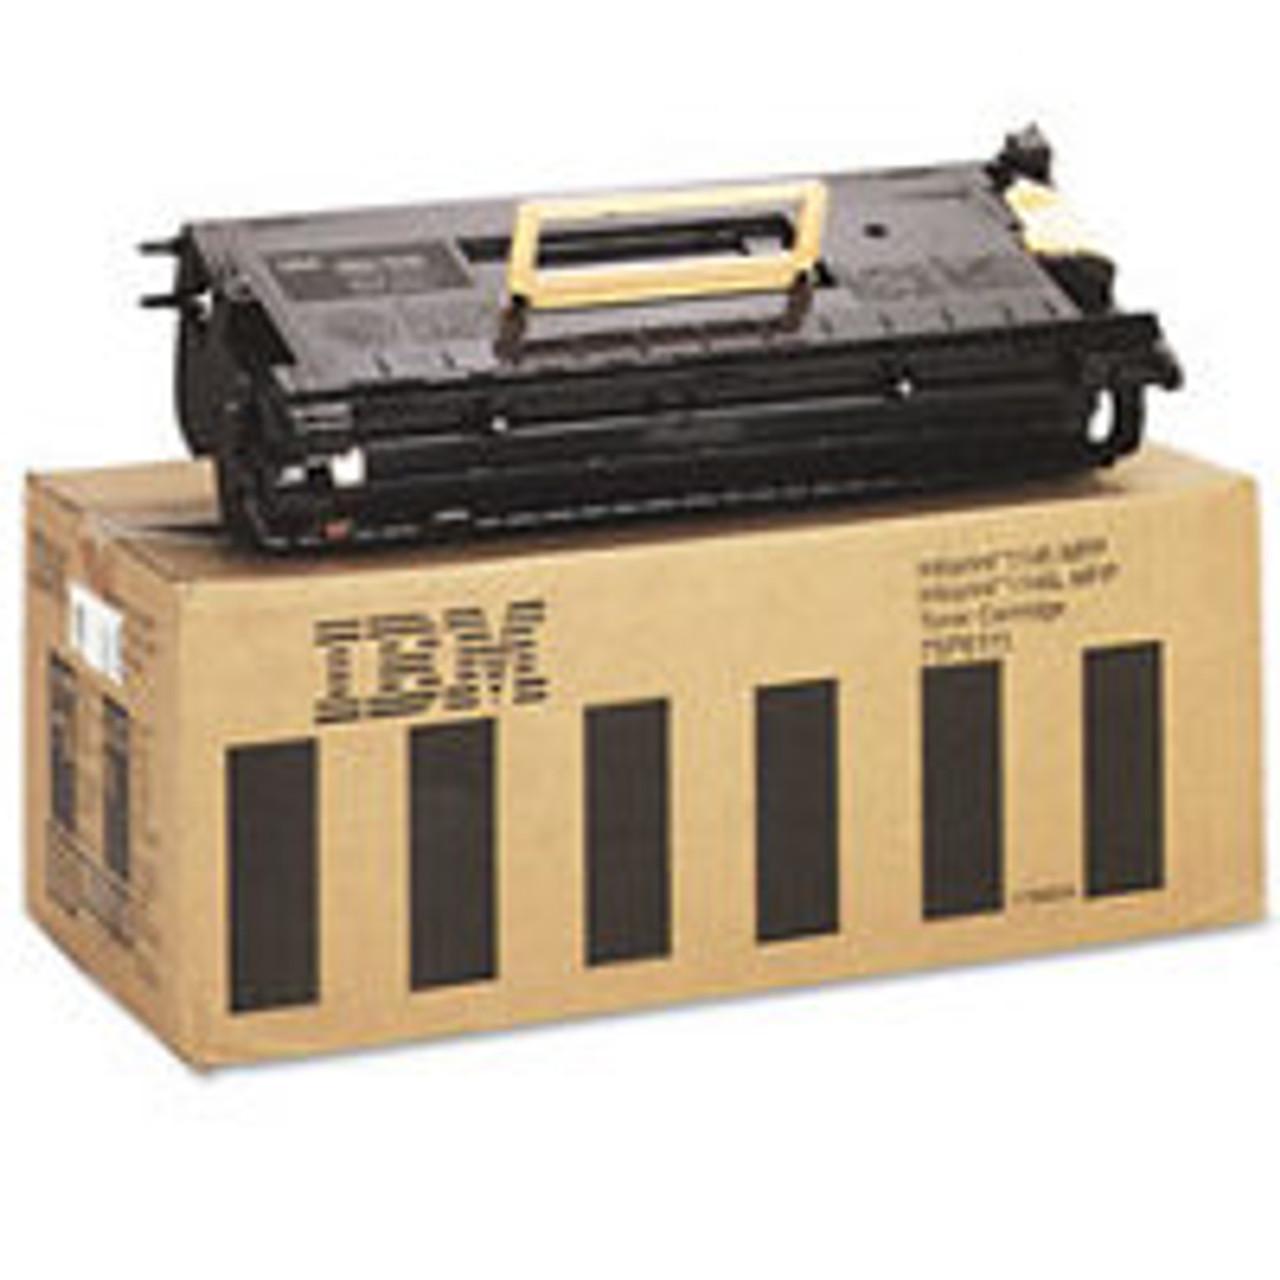 IBM 1145 MFP Toner Cartridge - New